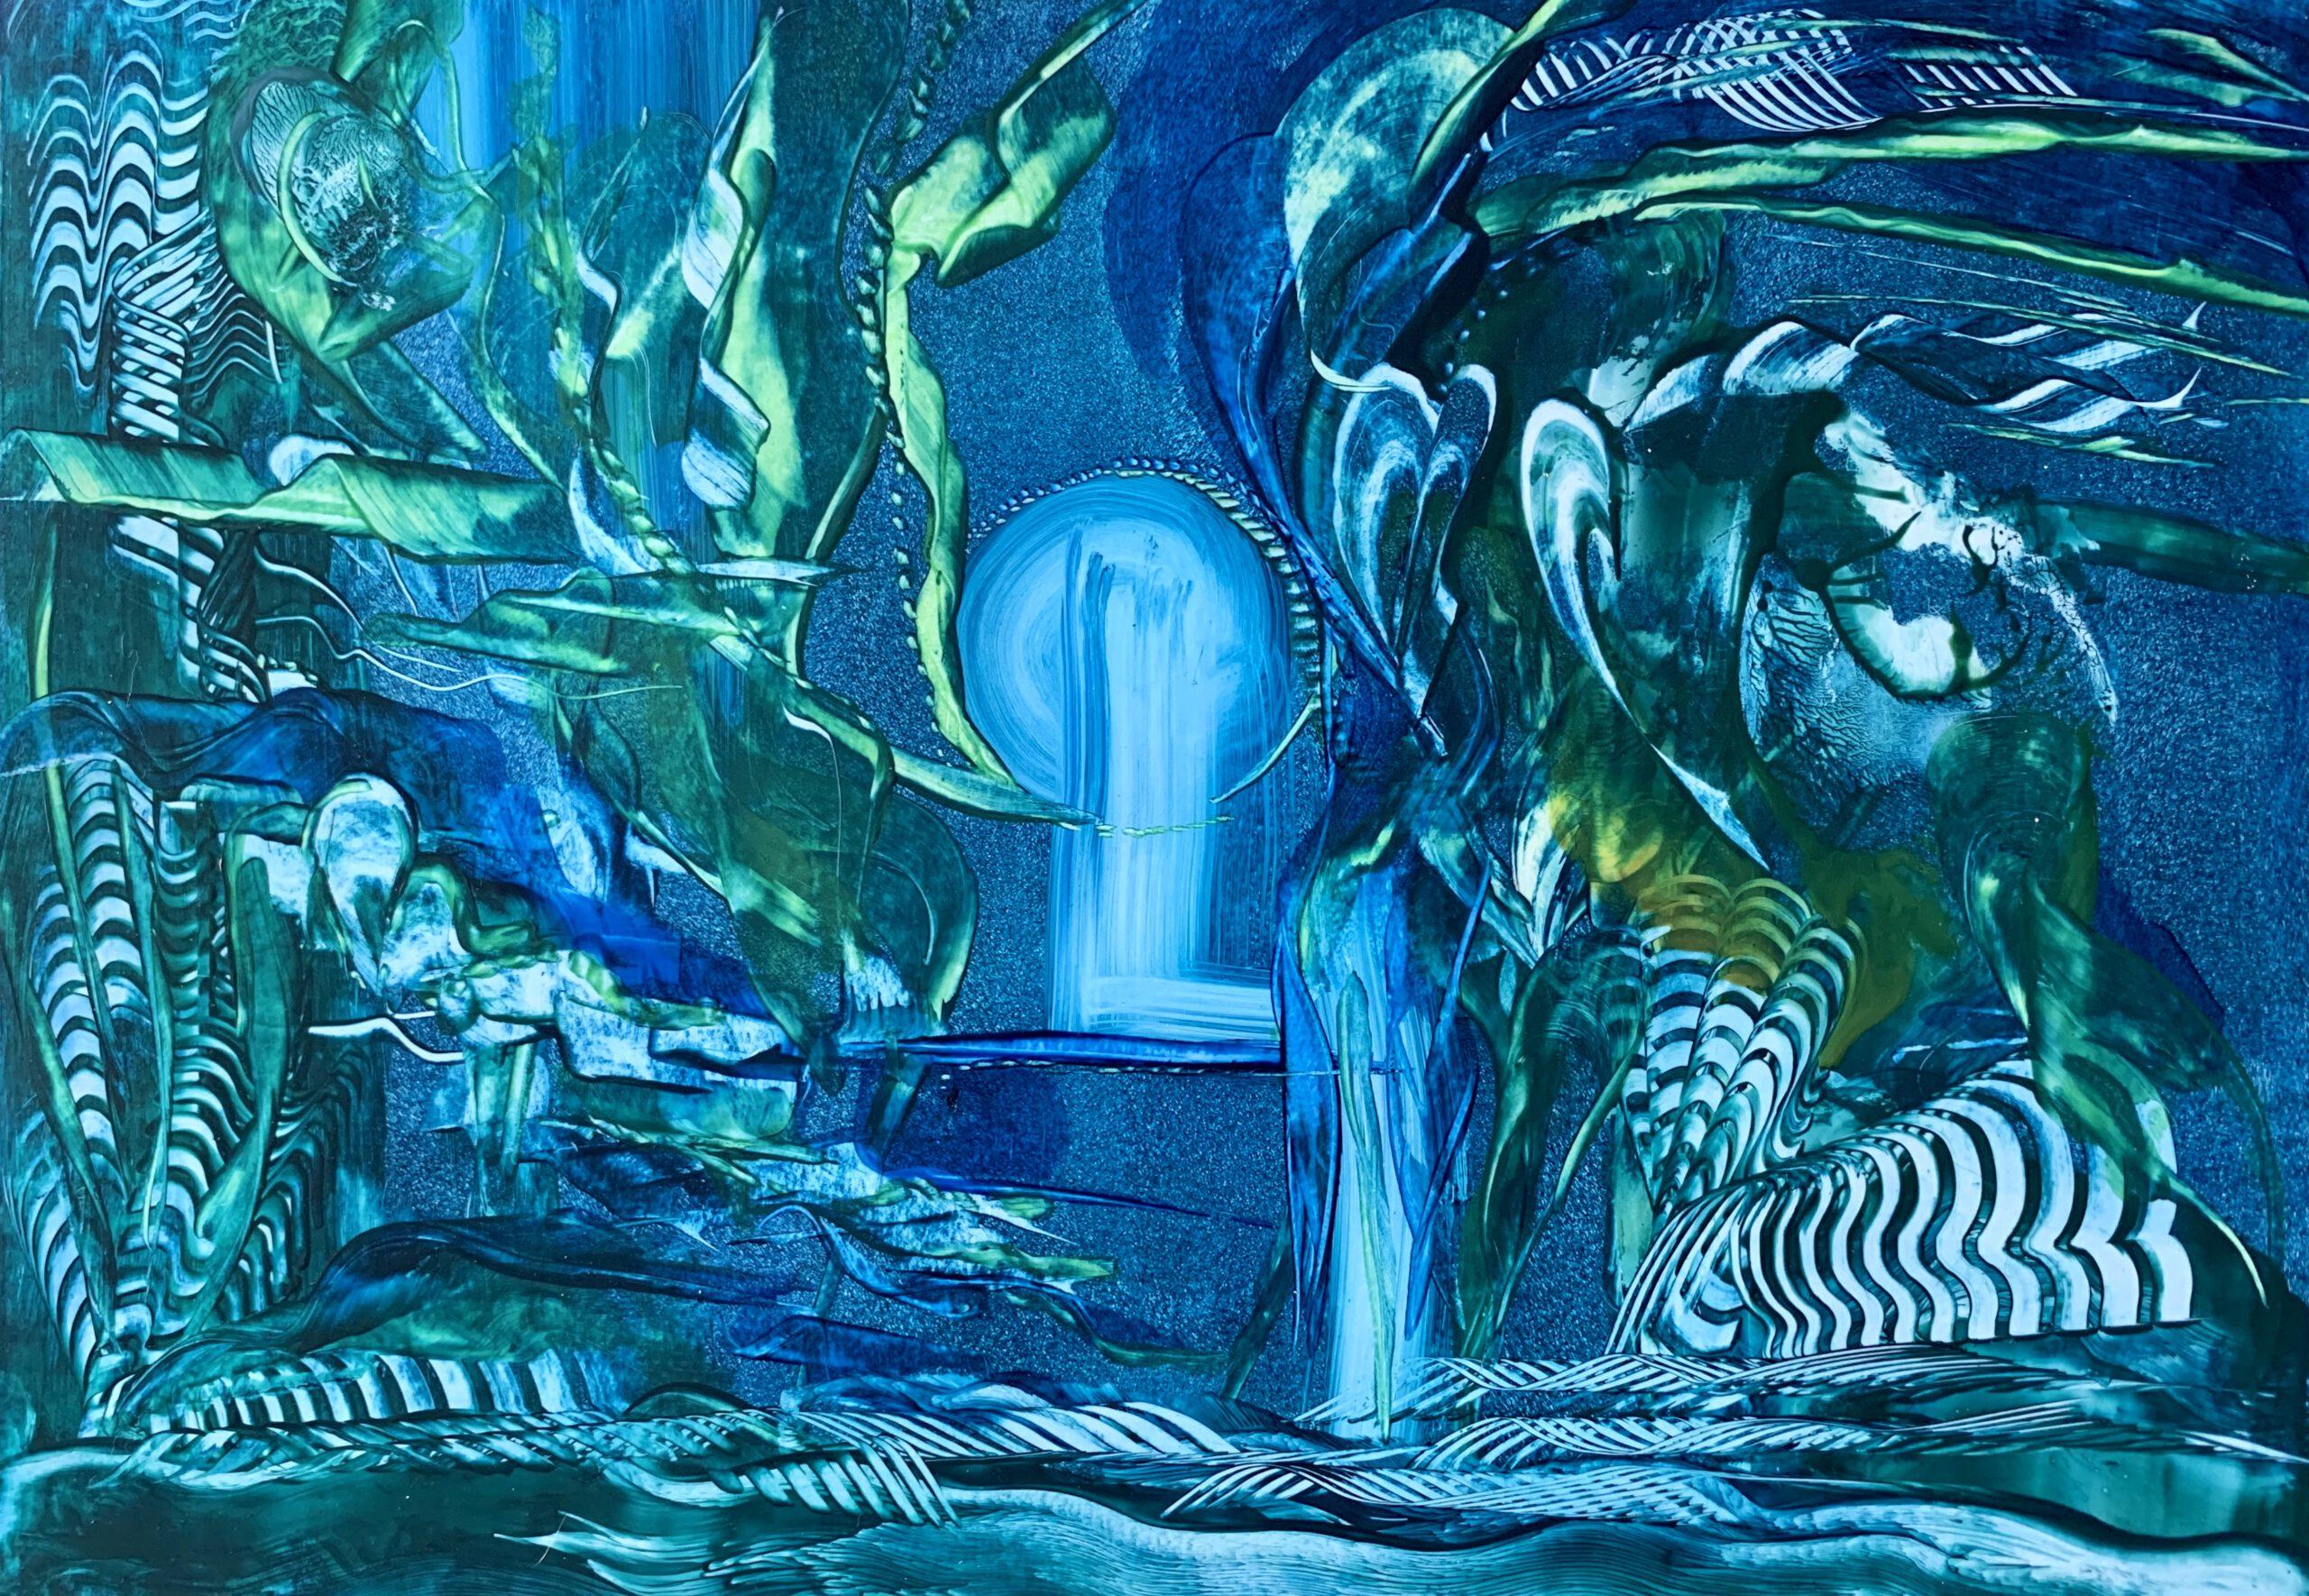 wax paintings a3 intuitief